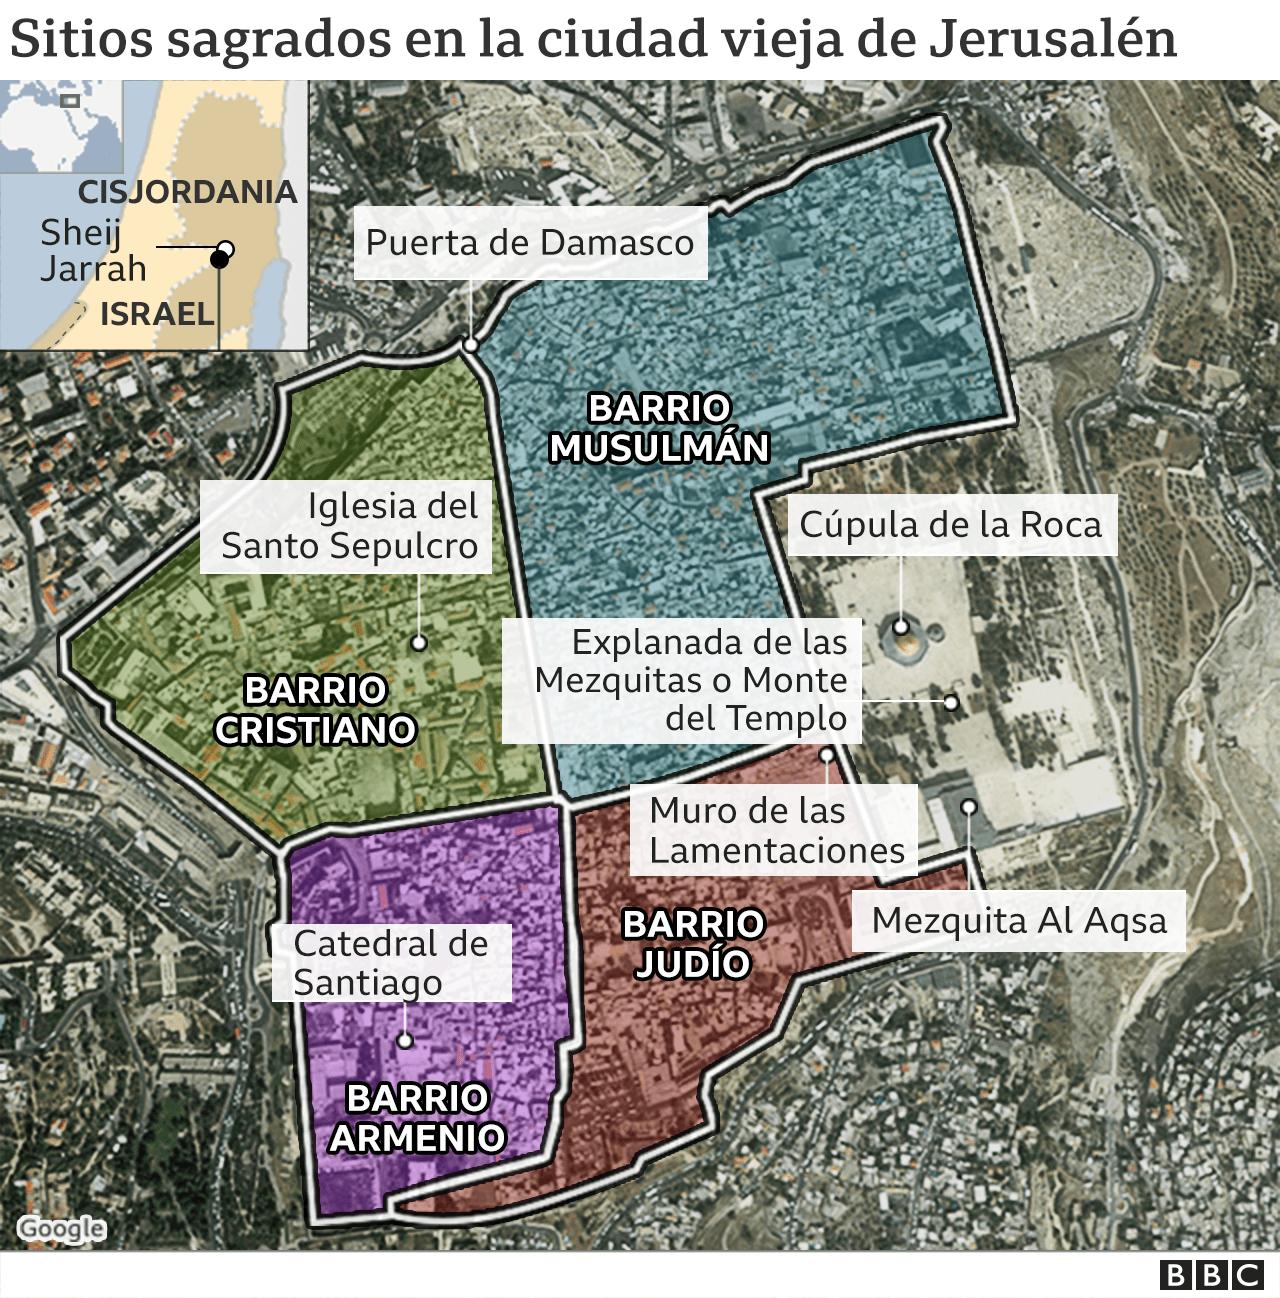 Mapa Ciudad Vieja de Jerusalén